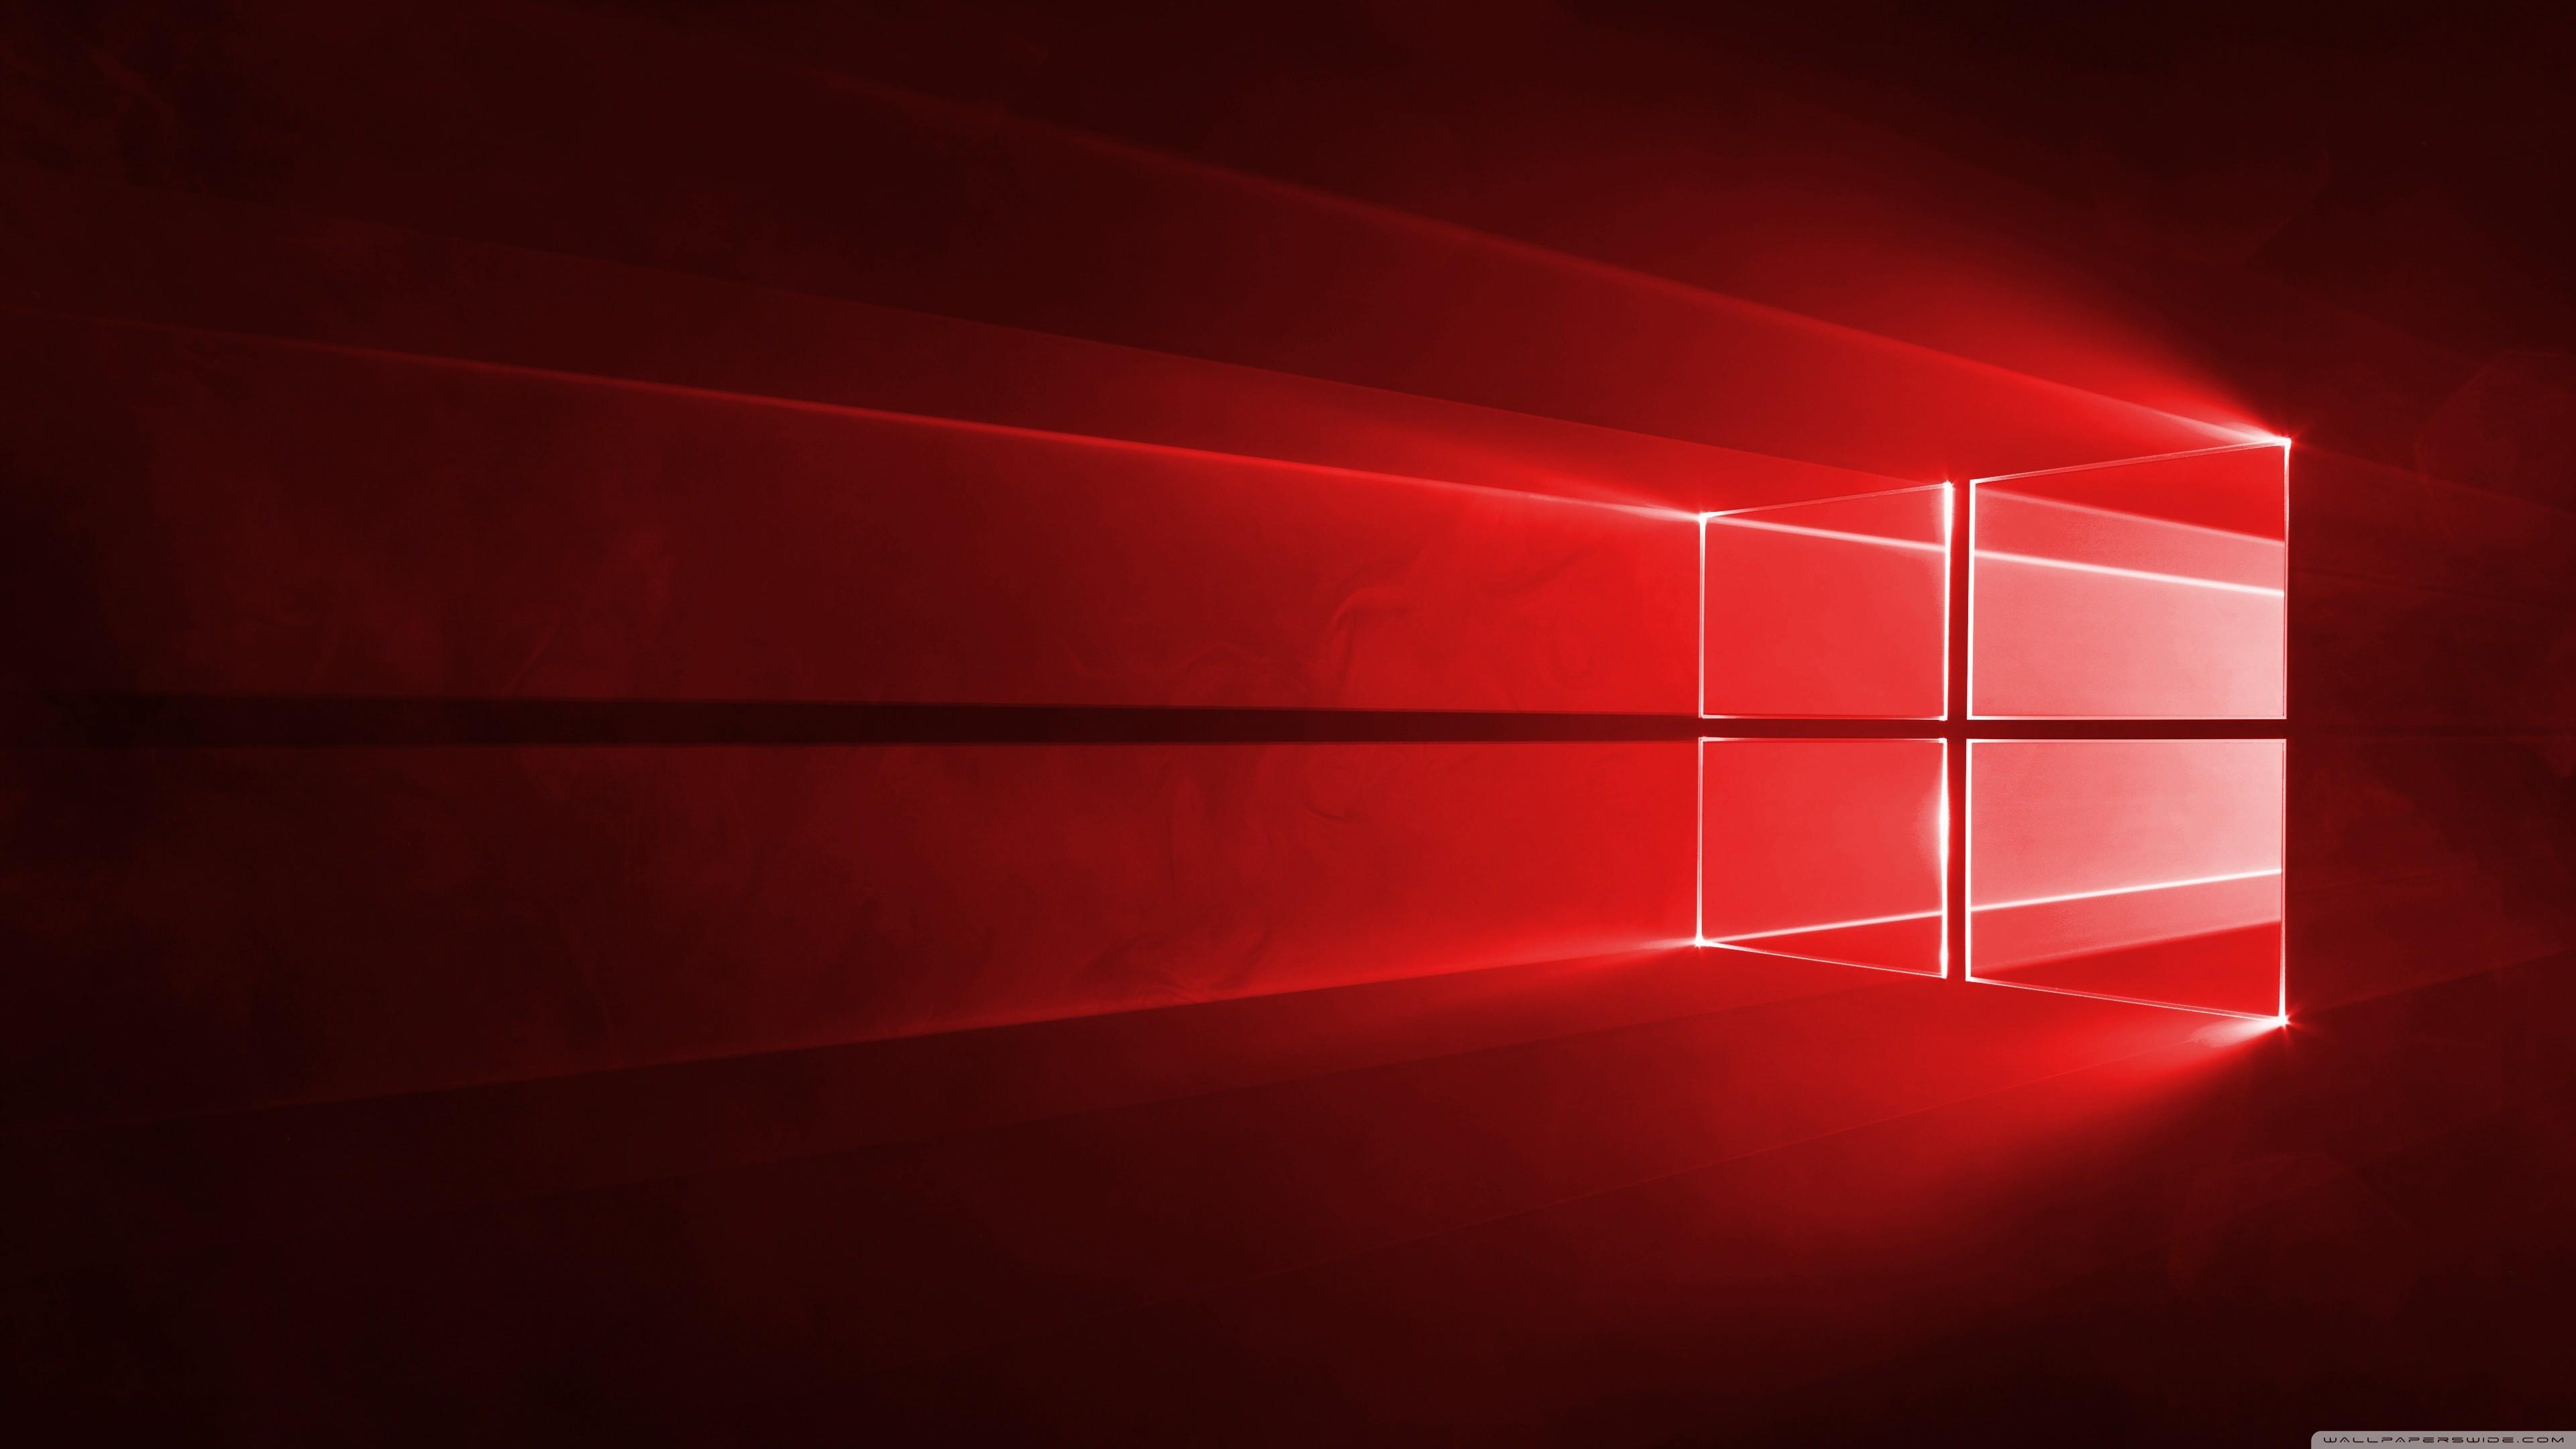 Windows 10 Red in 4K HD Wide Wallpaper for Widescreen